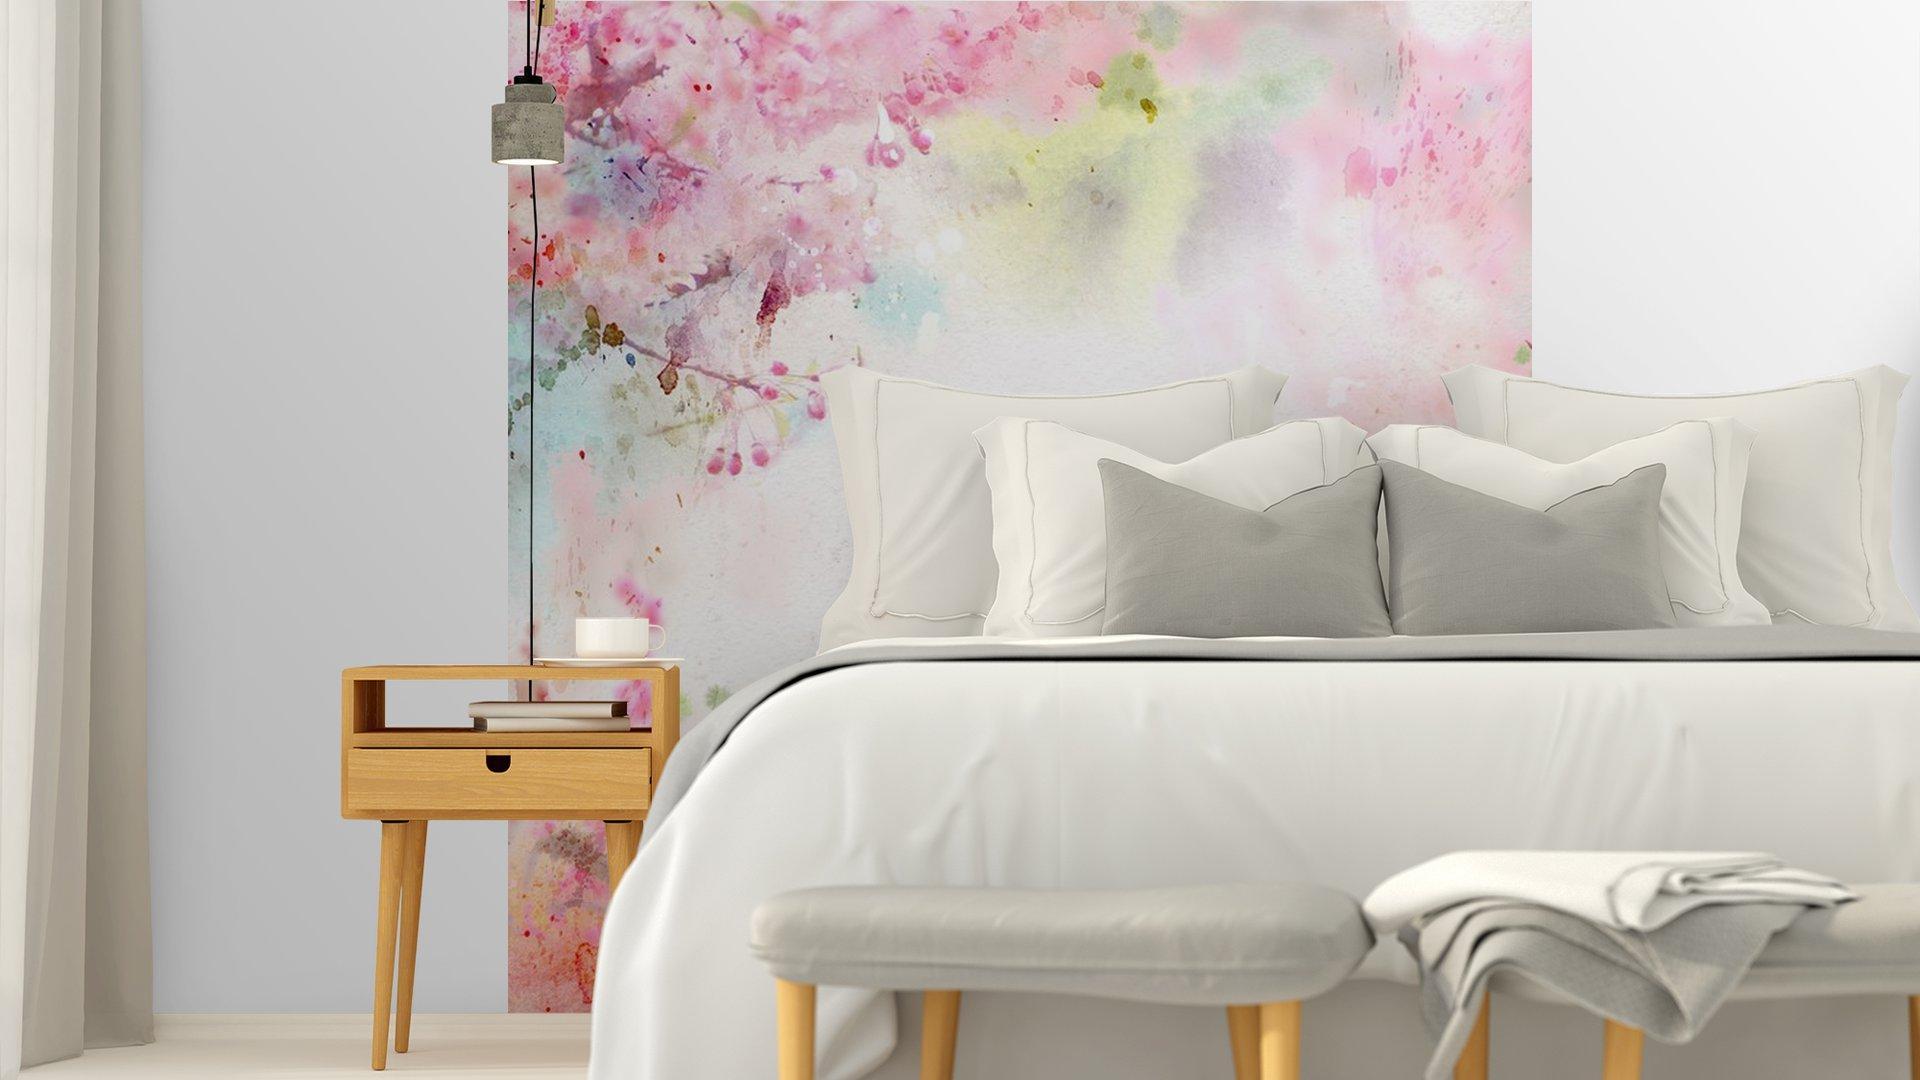 ACUARELA DE FONDO ESCÉNICO COMPOSICIÓN FLORAL SAKURA5 - Fotomural Tapiz Composición Floral Sakura Tipo Acuarela